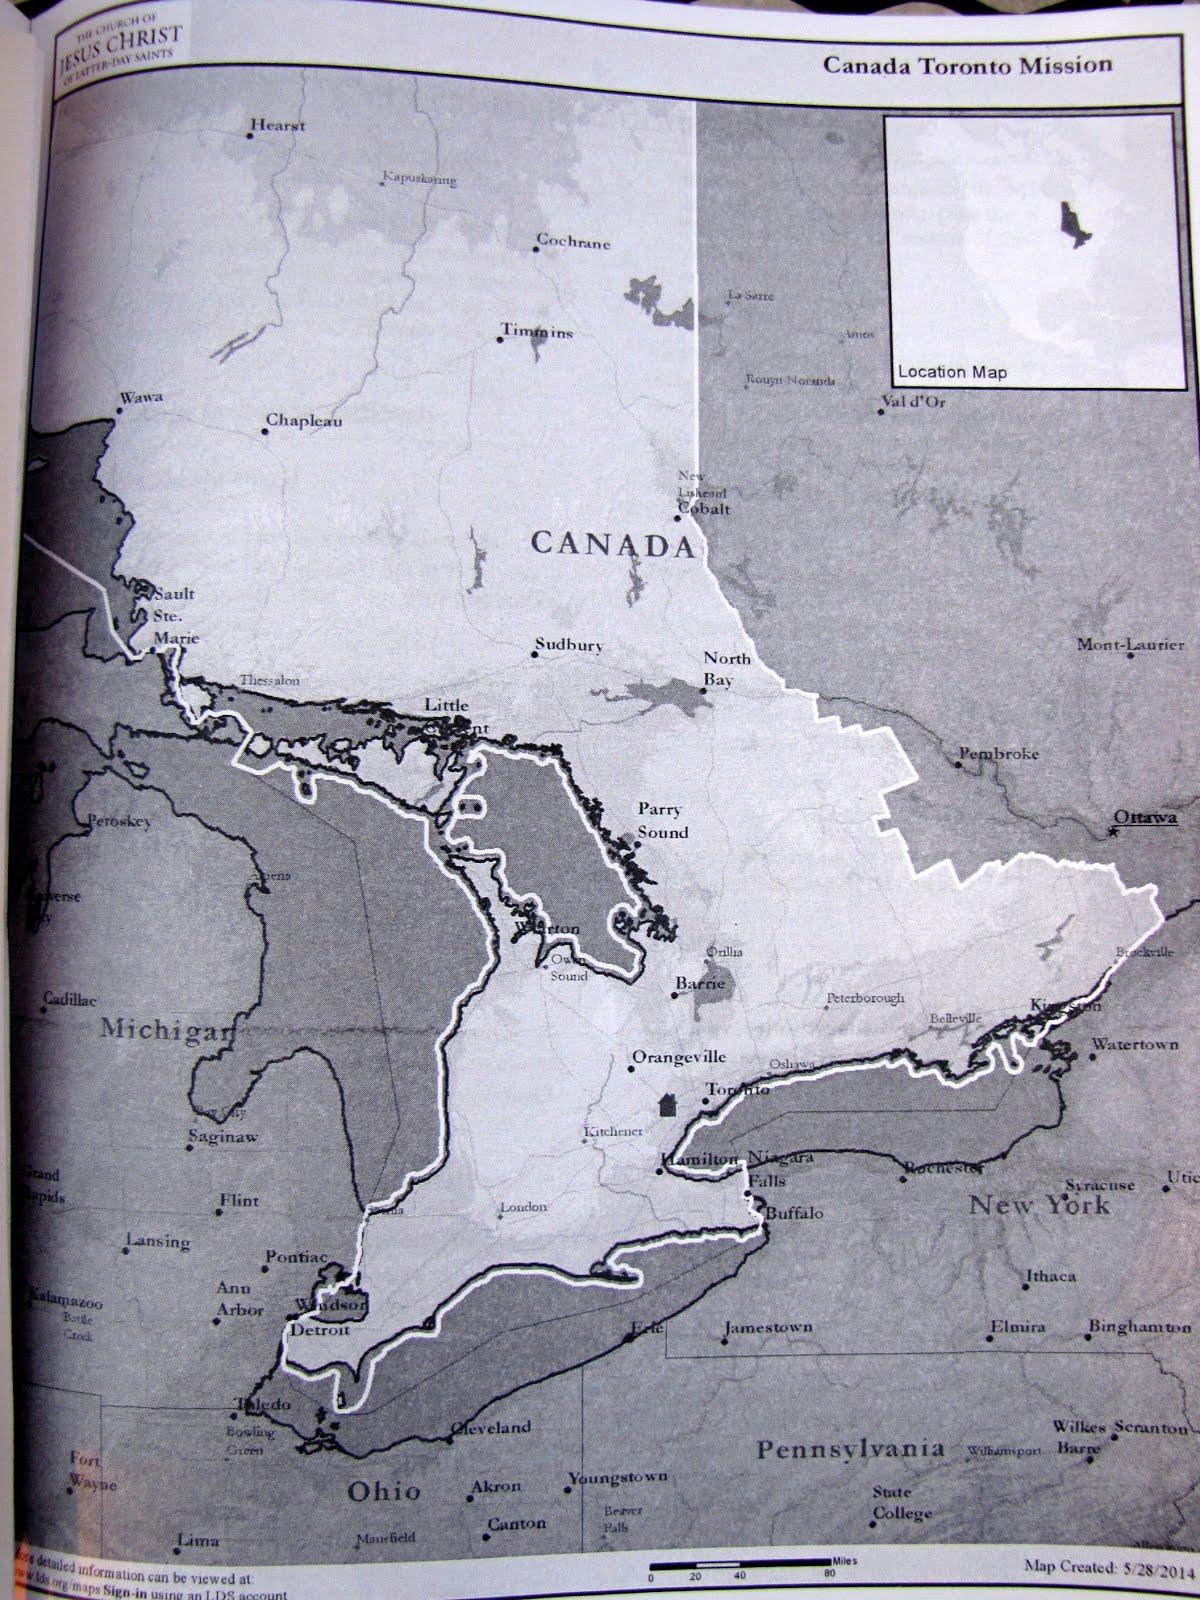 Canada Toronto Mission